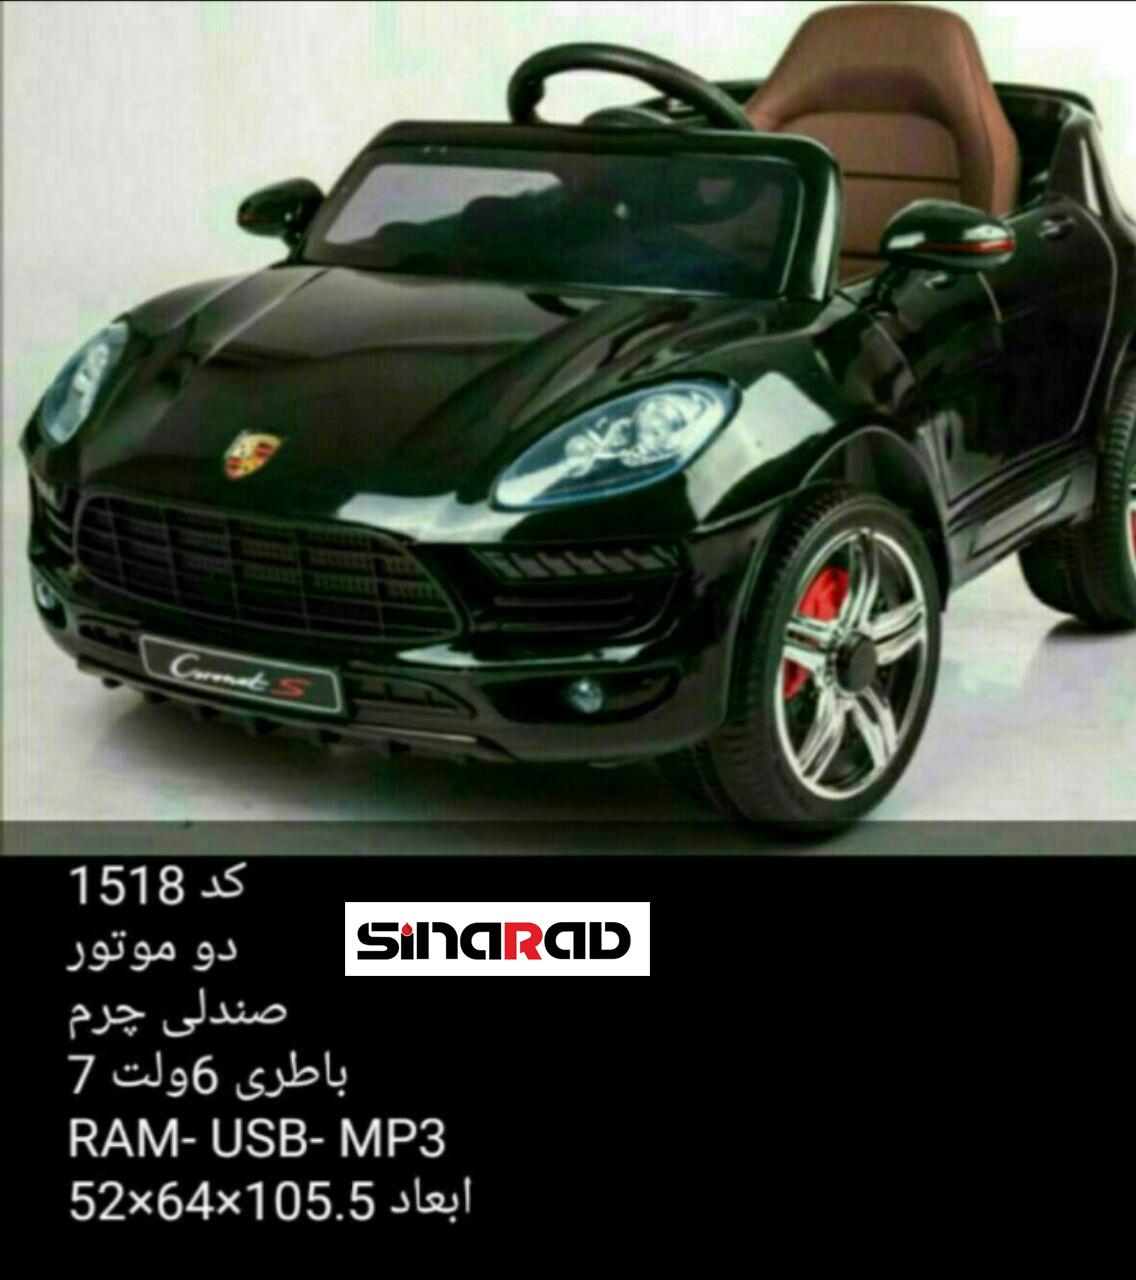 سایت خرید لوازم ماشین شارژی جدید